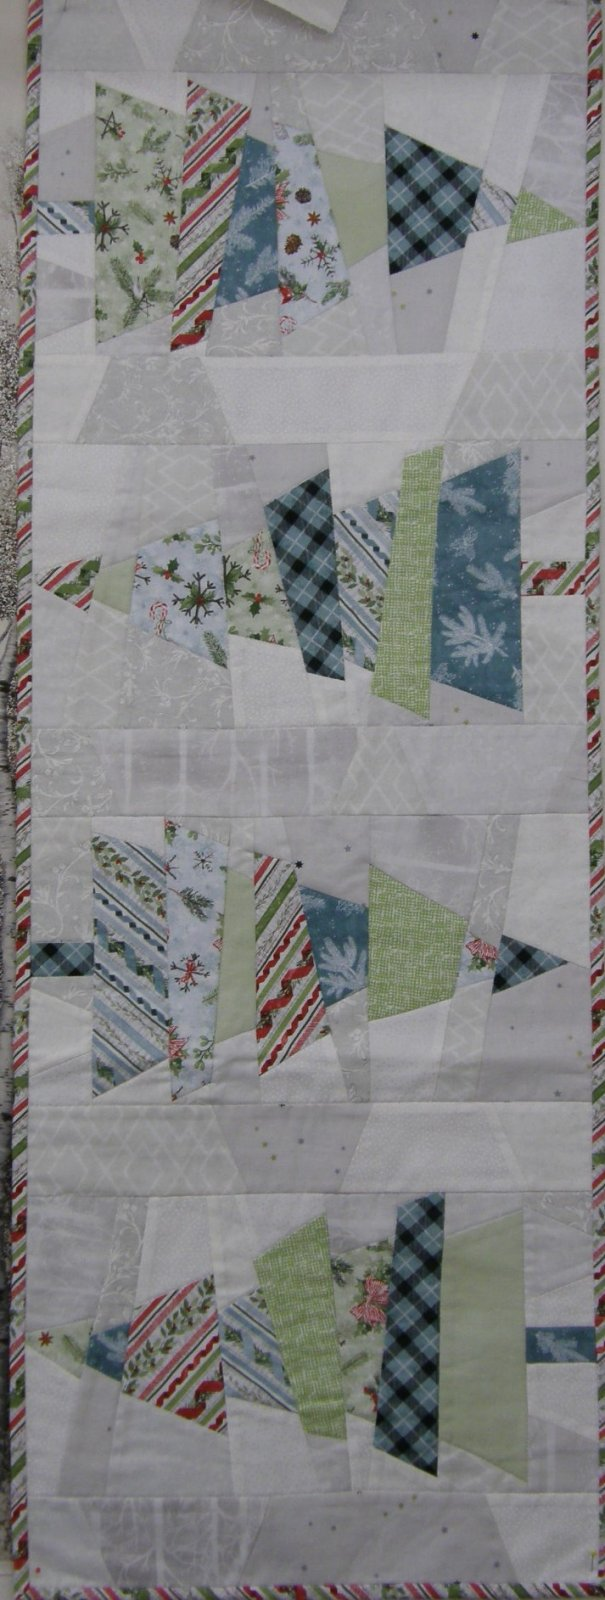 Crazy Christmas Tree Kit Woodland Friends fabrics